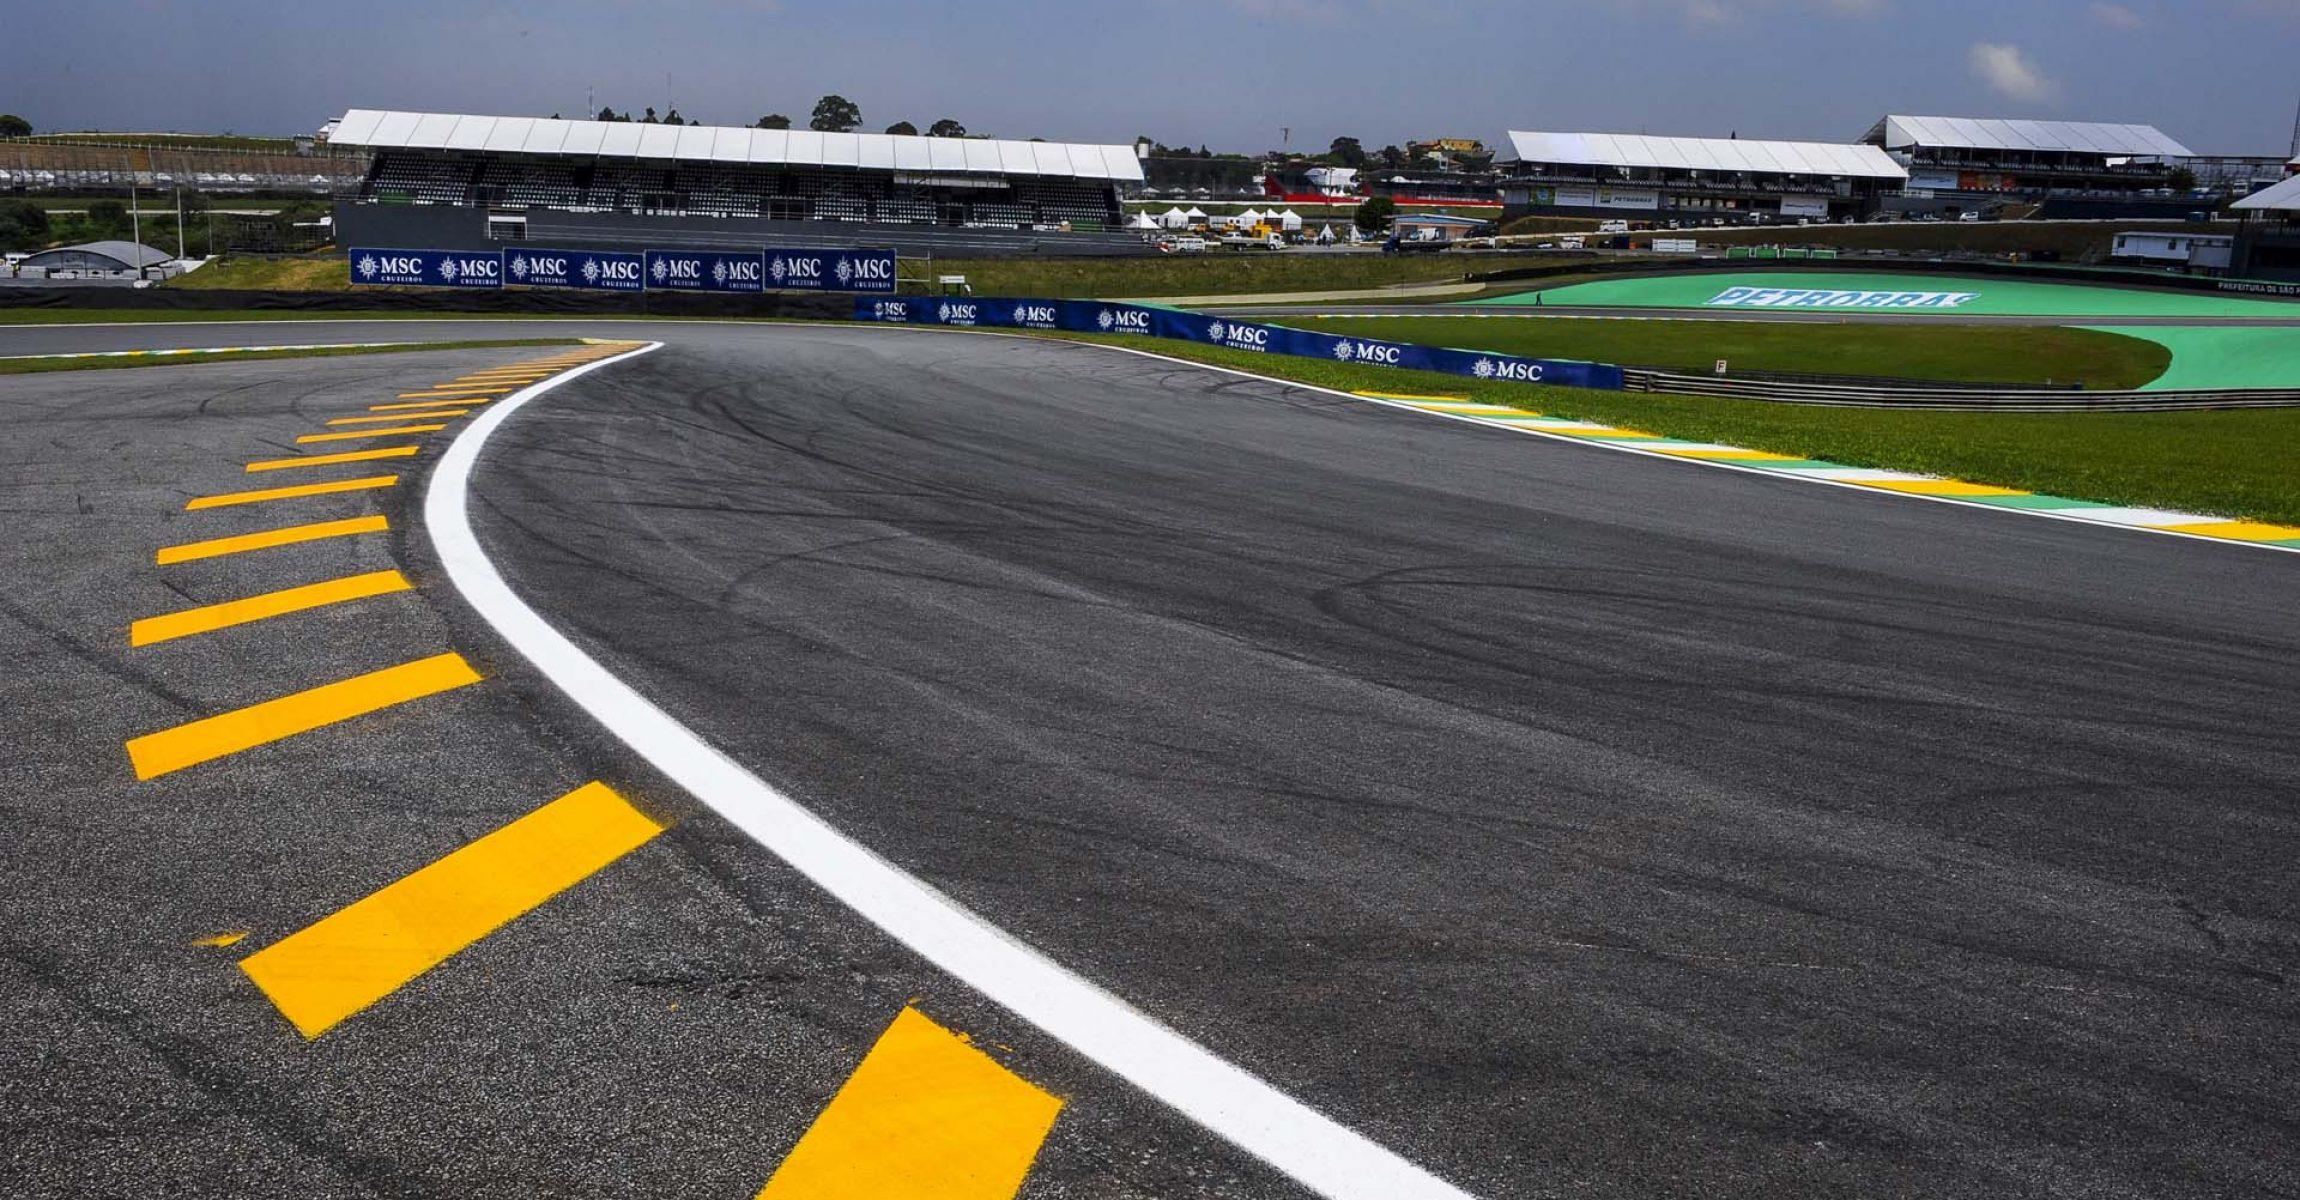 MOTORSPORT - F1 2010 - BRASIL GRAND PRIX / GRAND PRIX DU BRESIL - SAO PAULO (BRA) - 04 TO 07/11/2010 - PHOTO : DPPI -  AMBIANCE